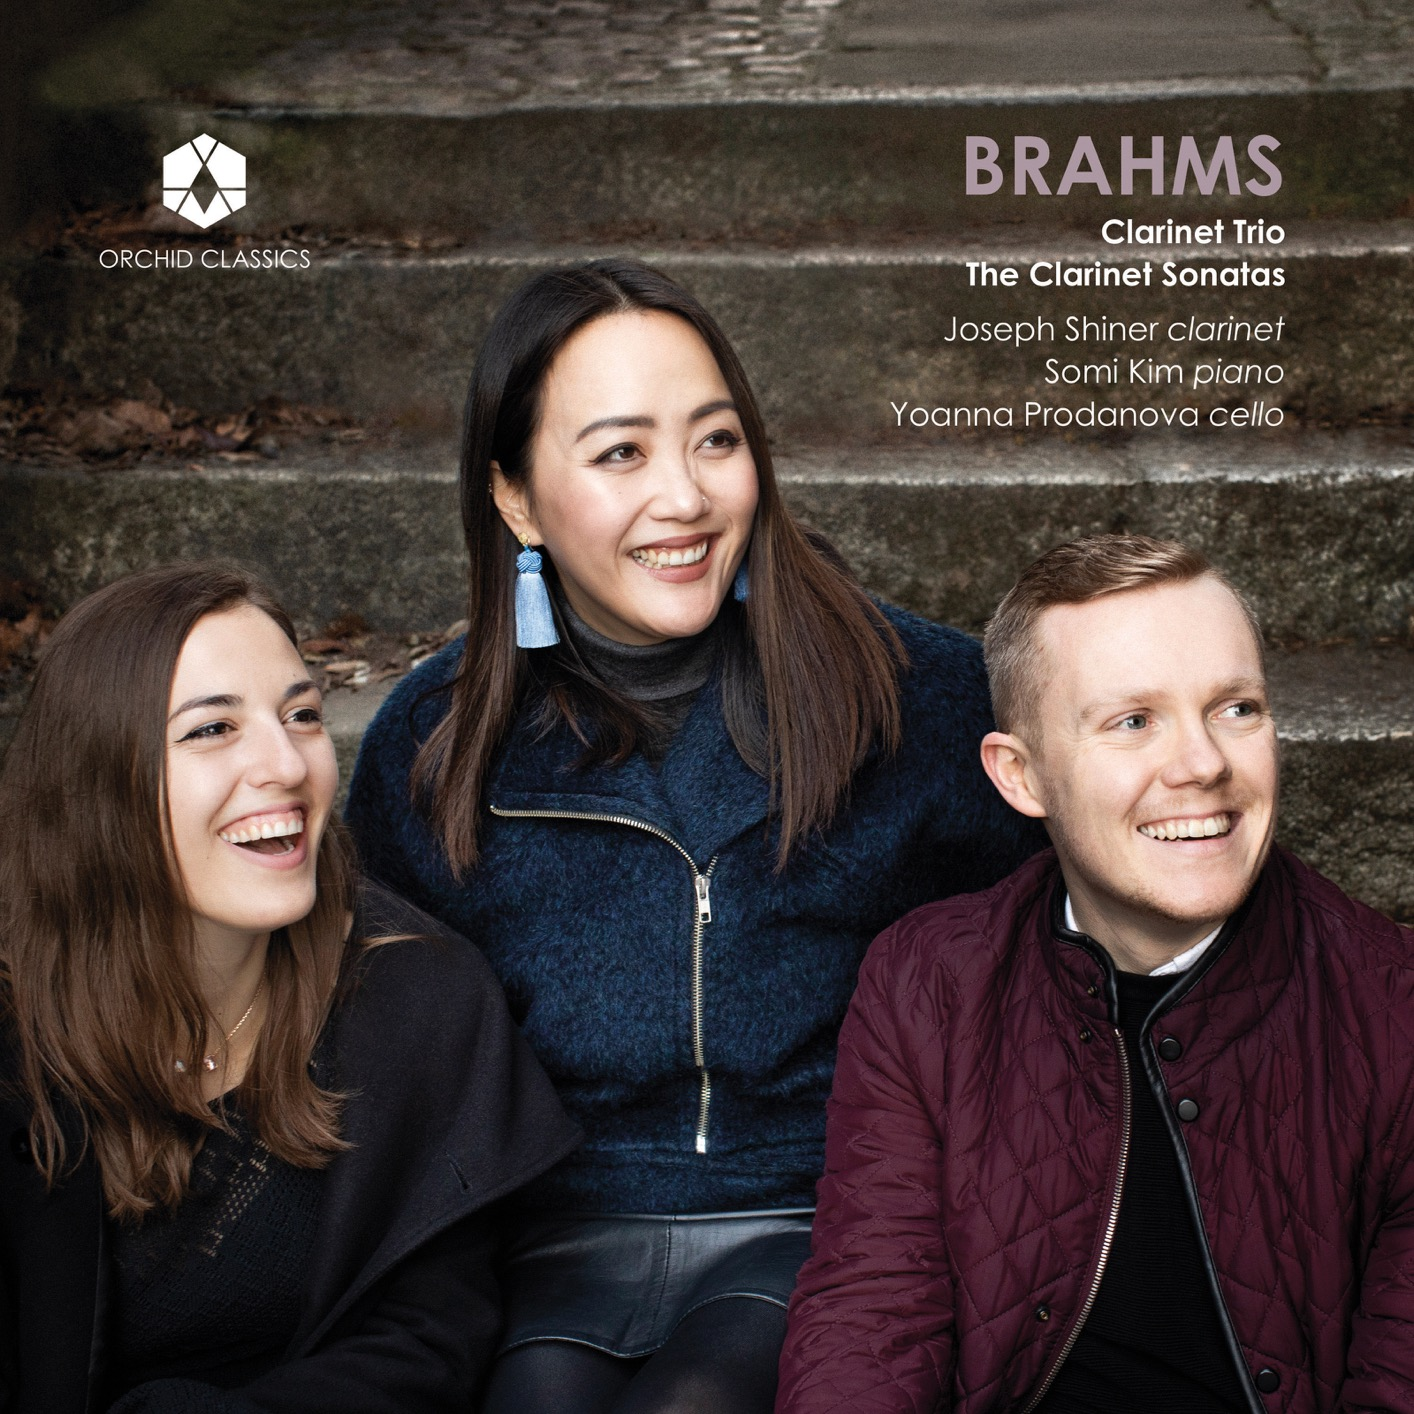 Music is the key: Joseph Shiner / Somi Kim / Yoanna